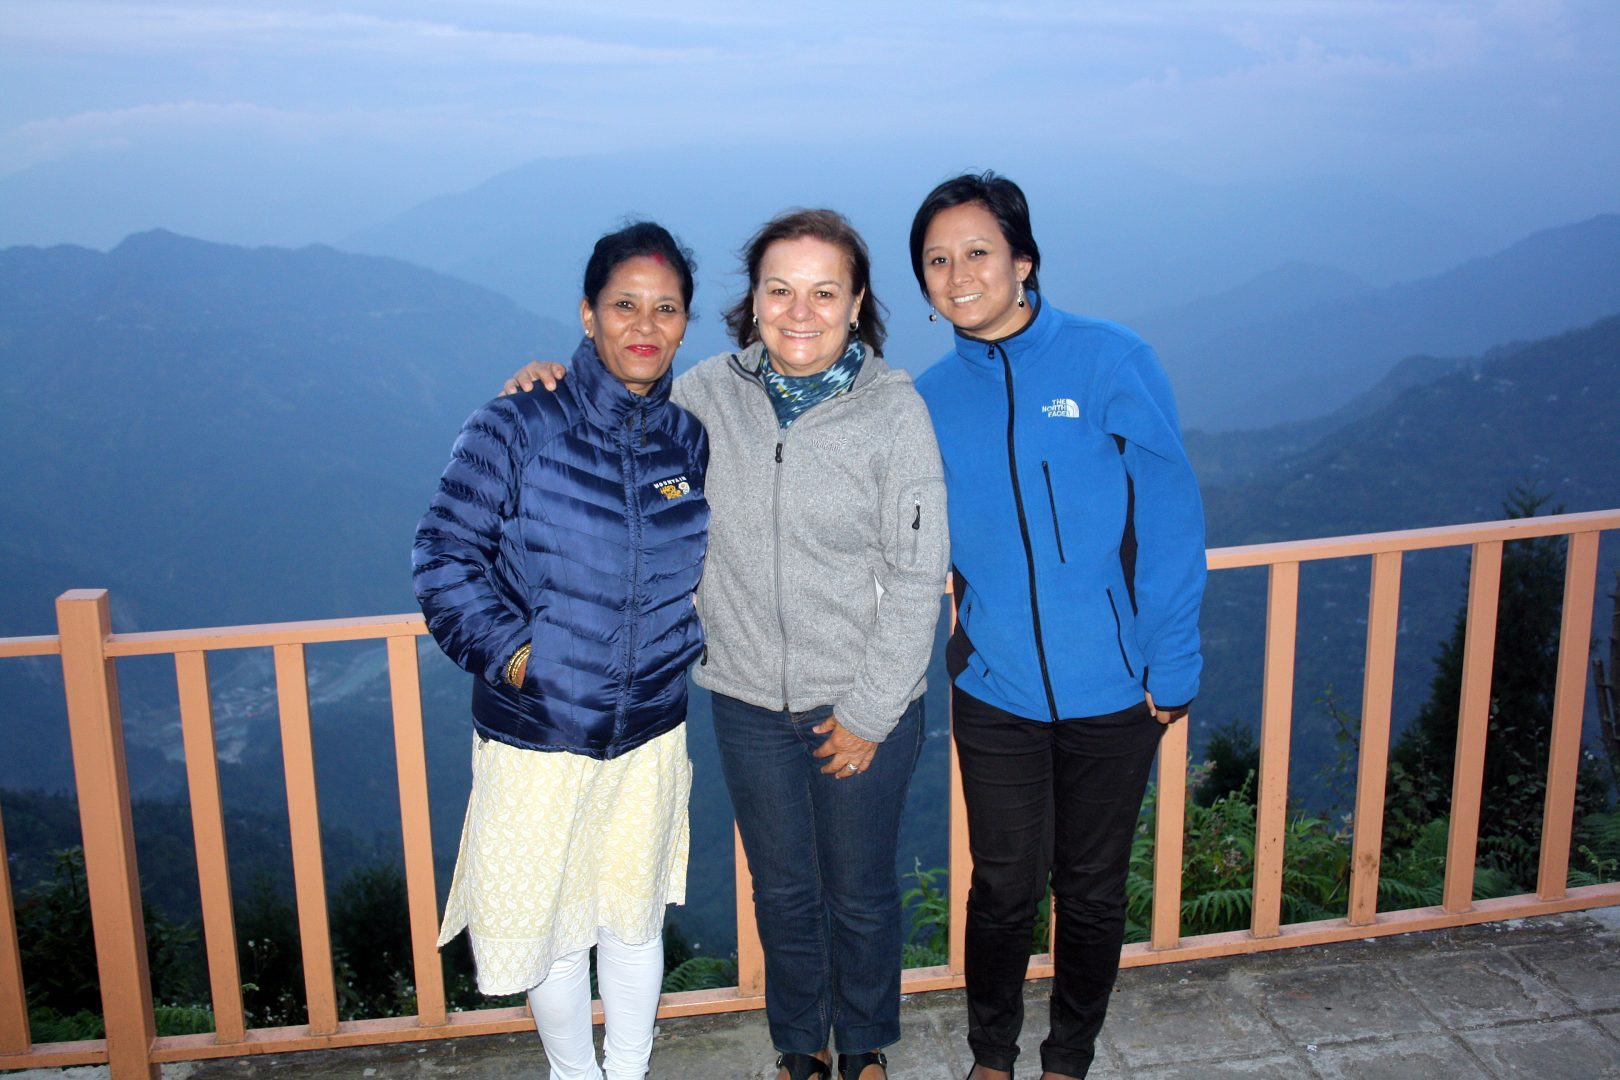 Photo du soir avec Karishma et sa maman Kalimpong Inde